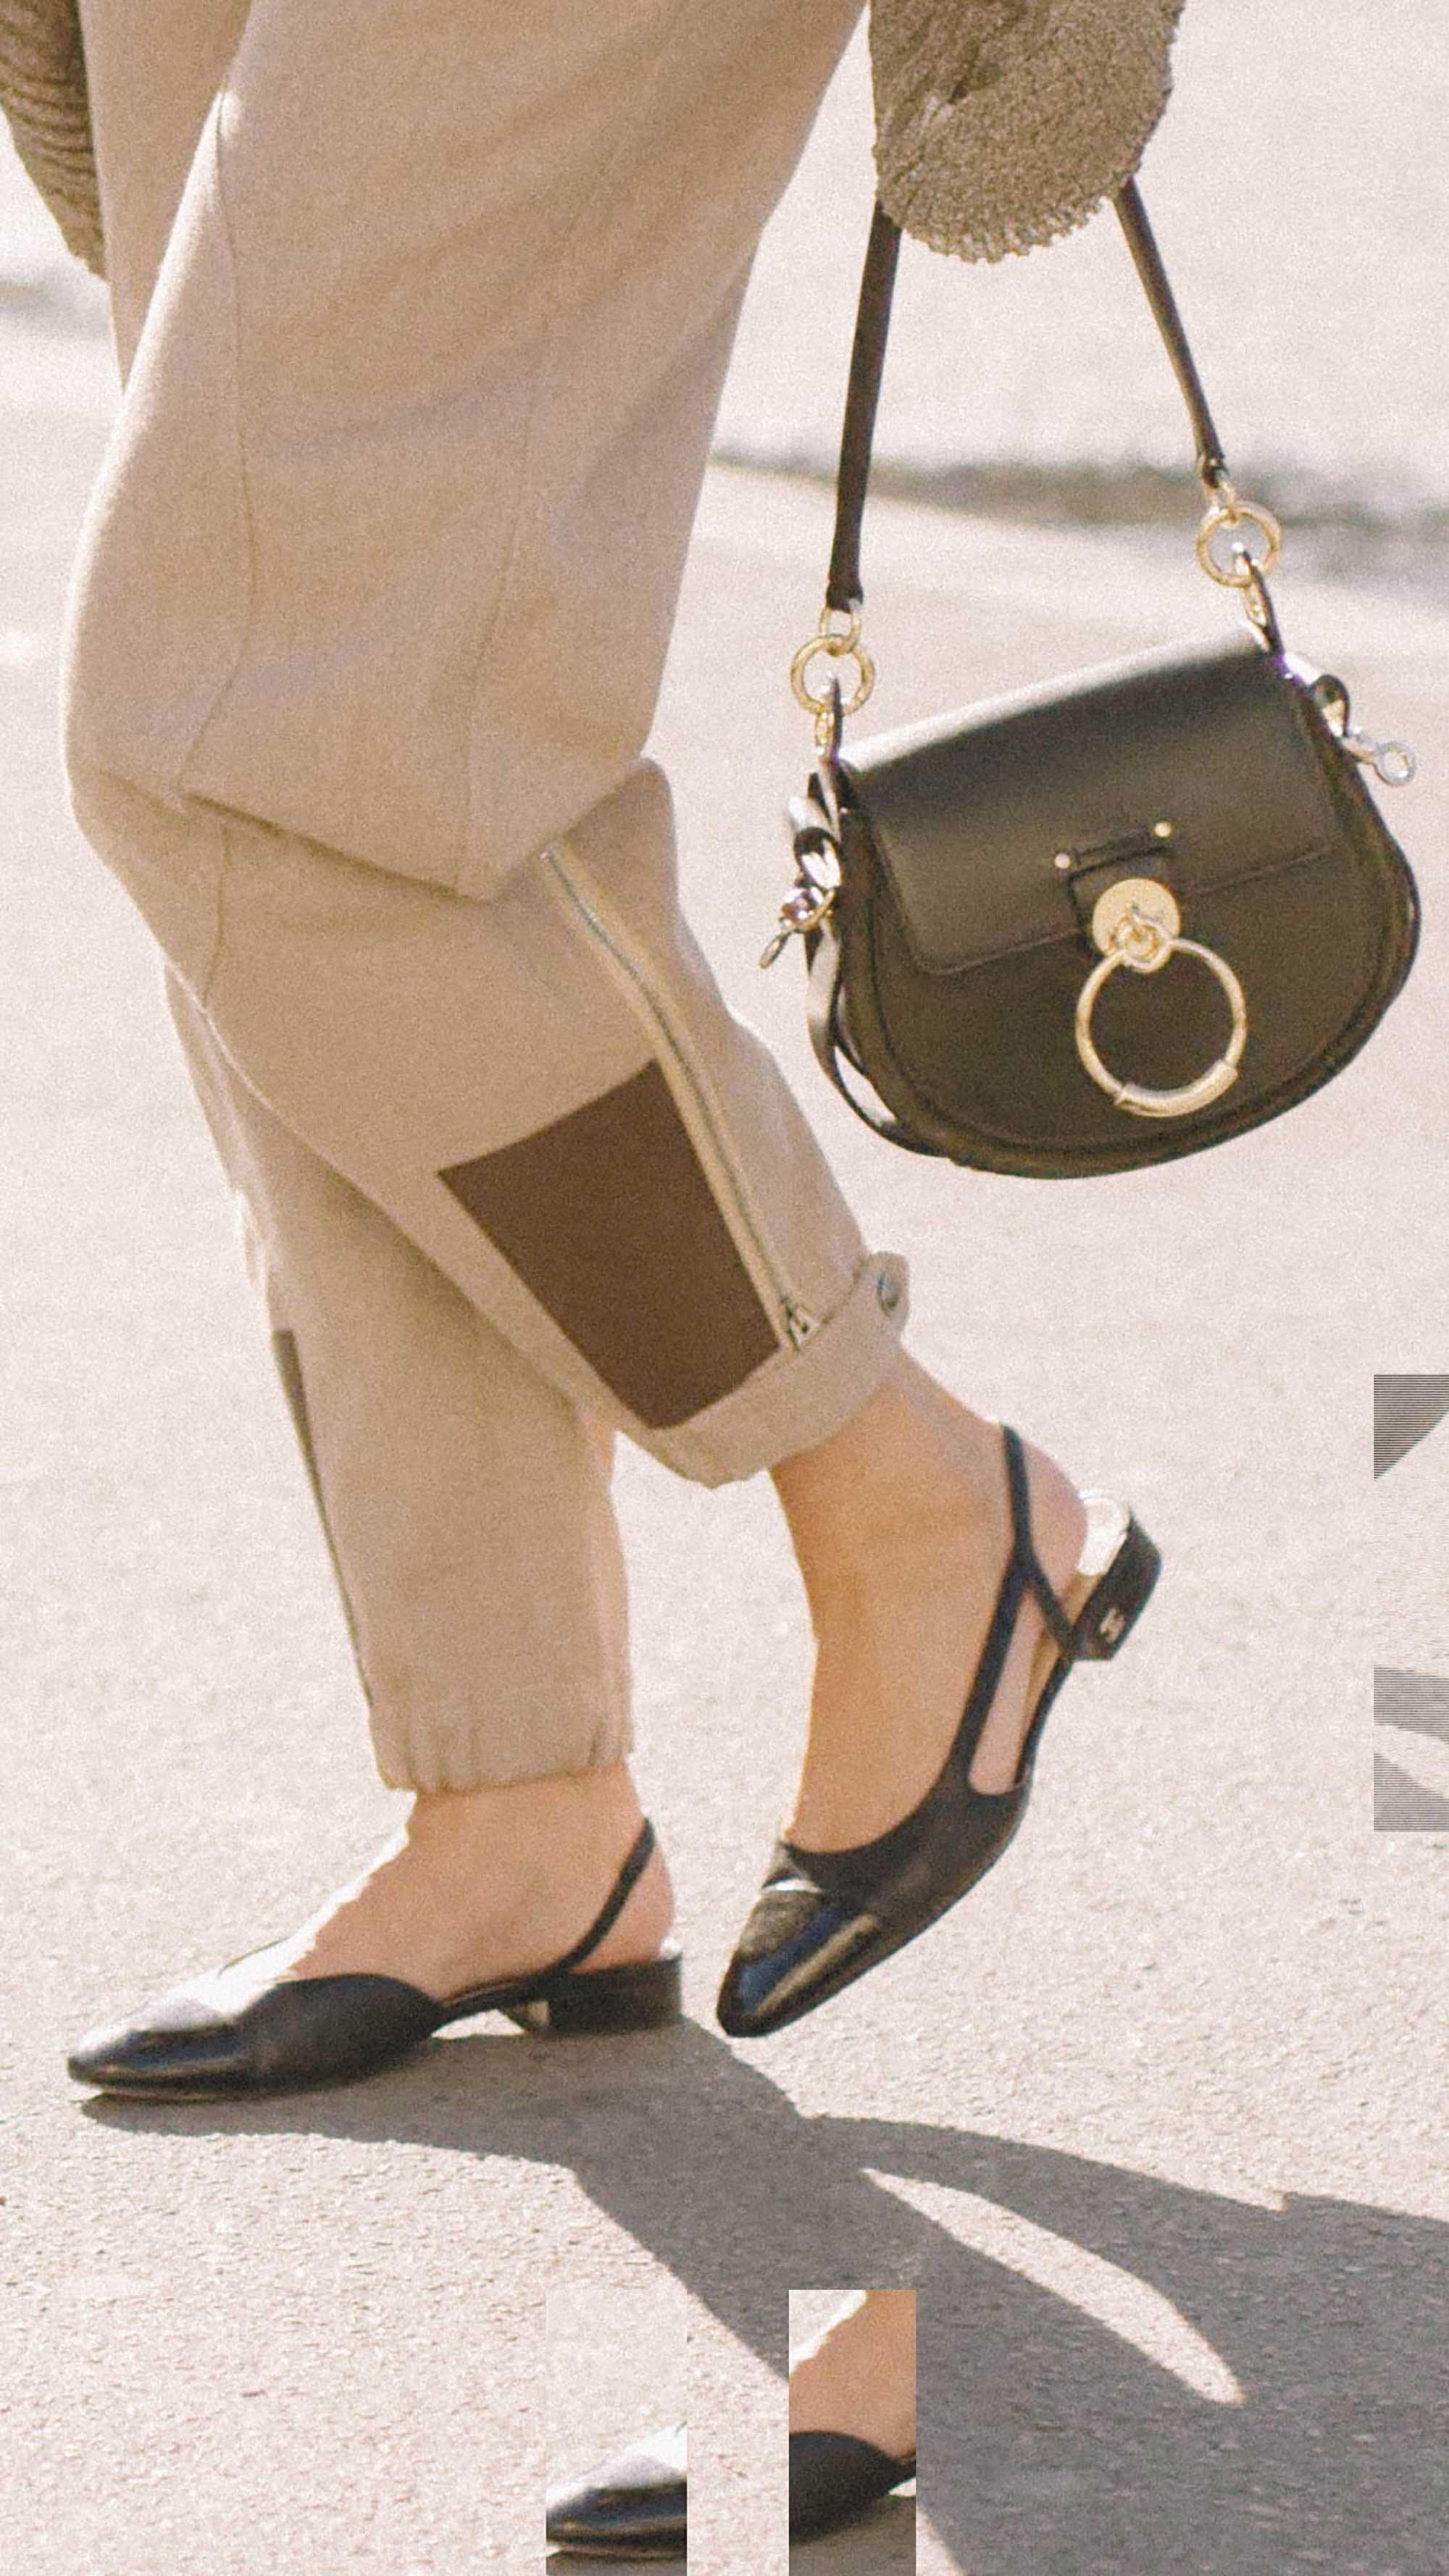 12 Best Chloe bags of Fashion Week -  CHLOe Roy mini leather bucket bag and Chloe Small Tess Leather Shoulder Bag7.jpg